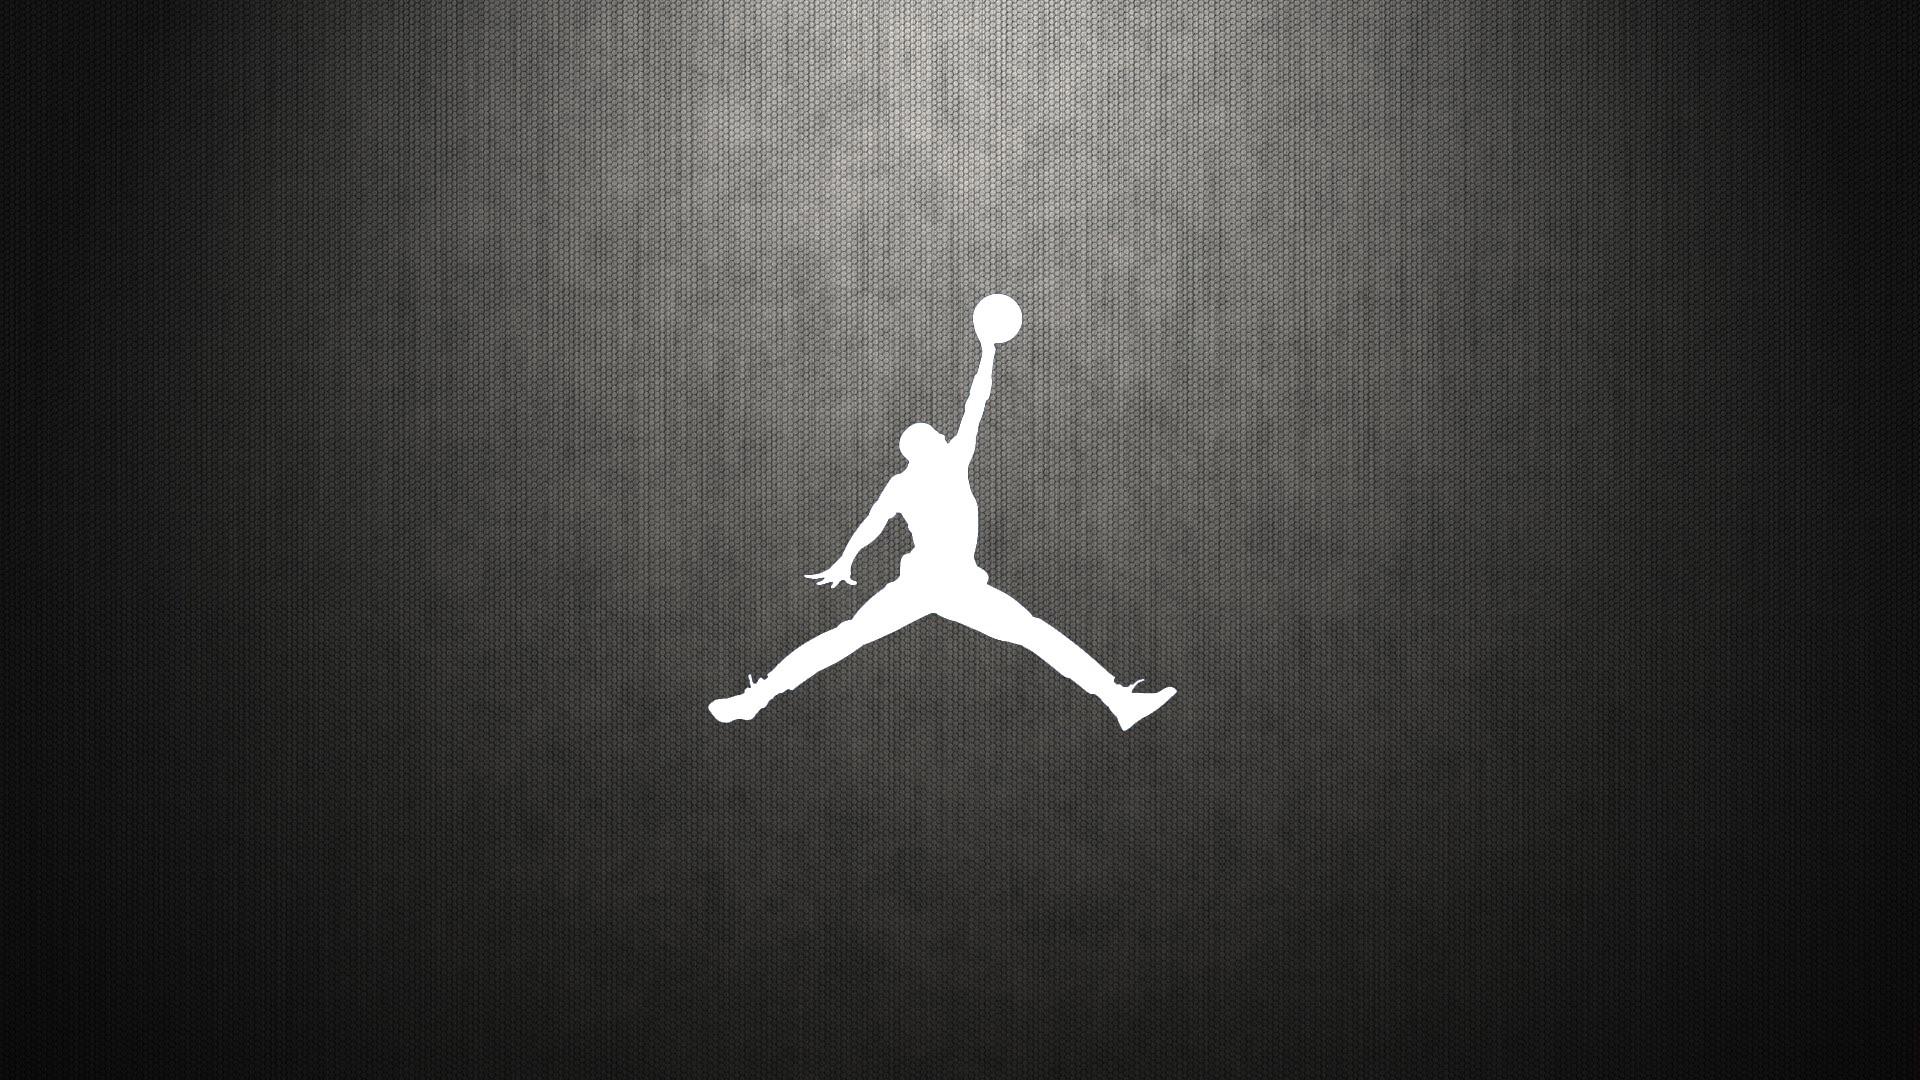 Download Jordan Logos Wallpaper 1920x1080 Wallpoper 397655 1920x1080